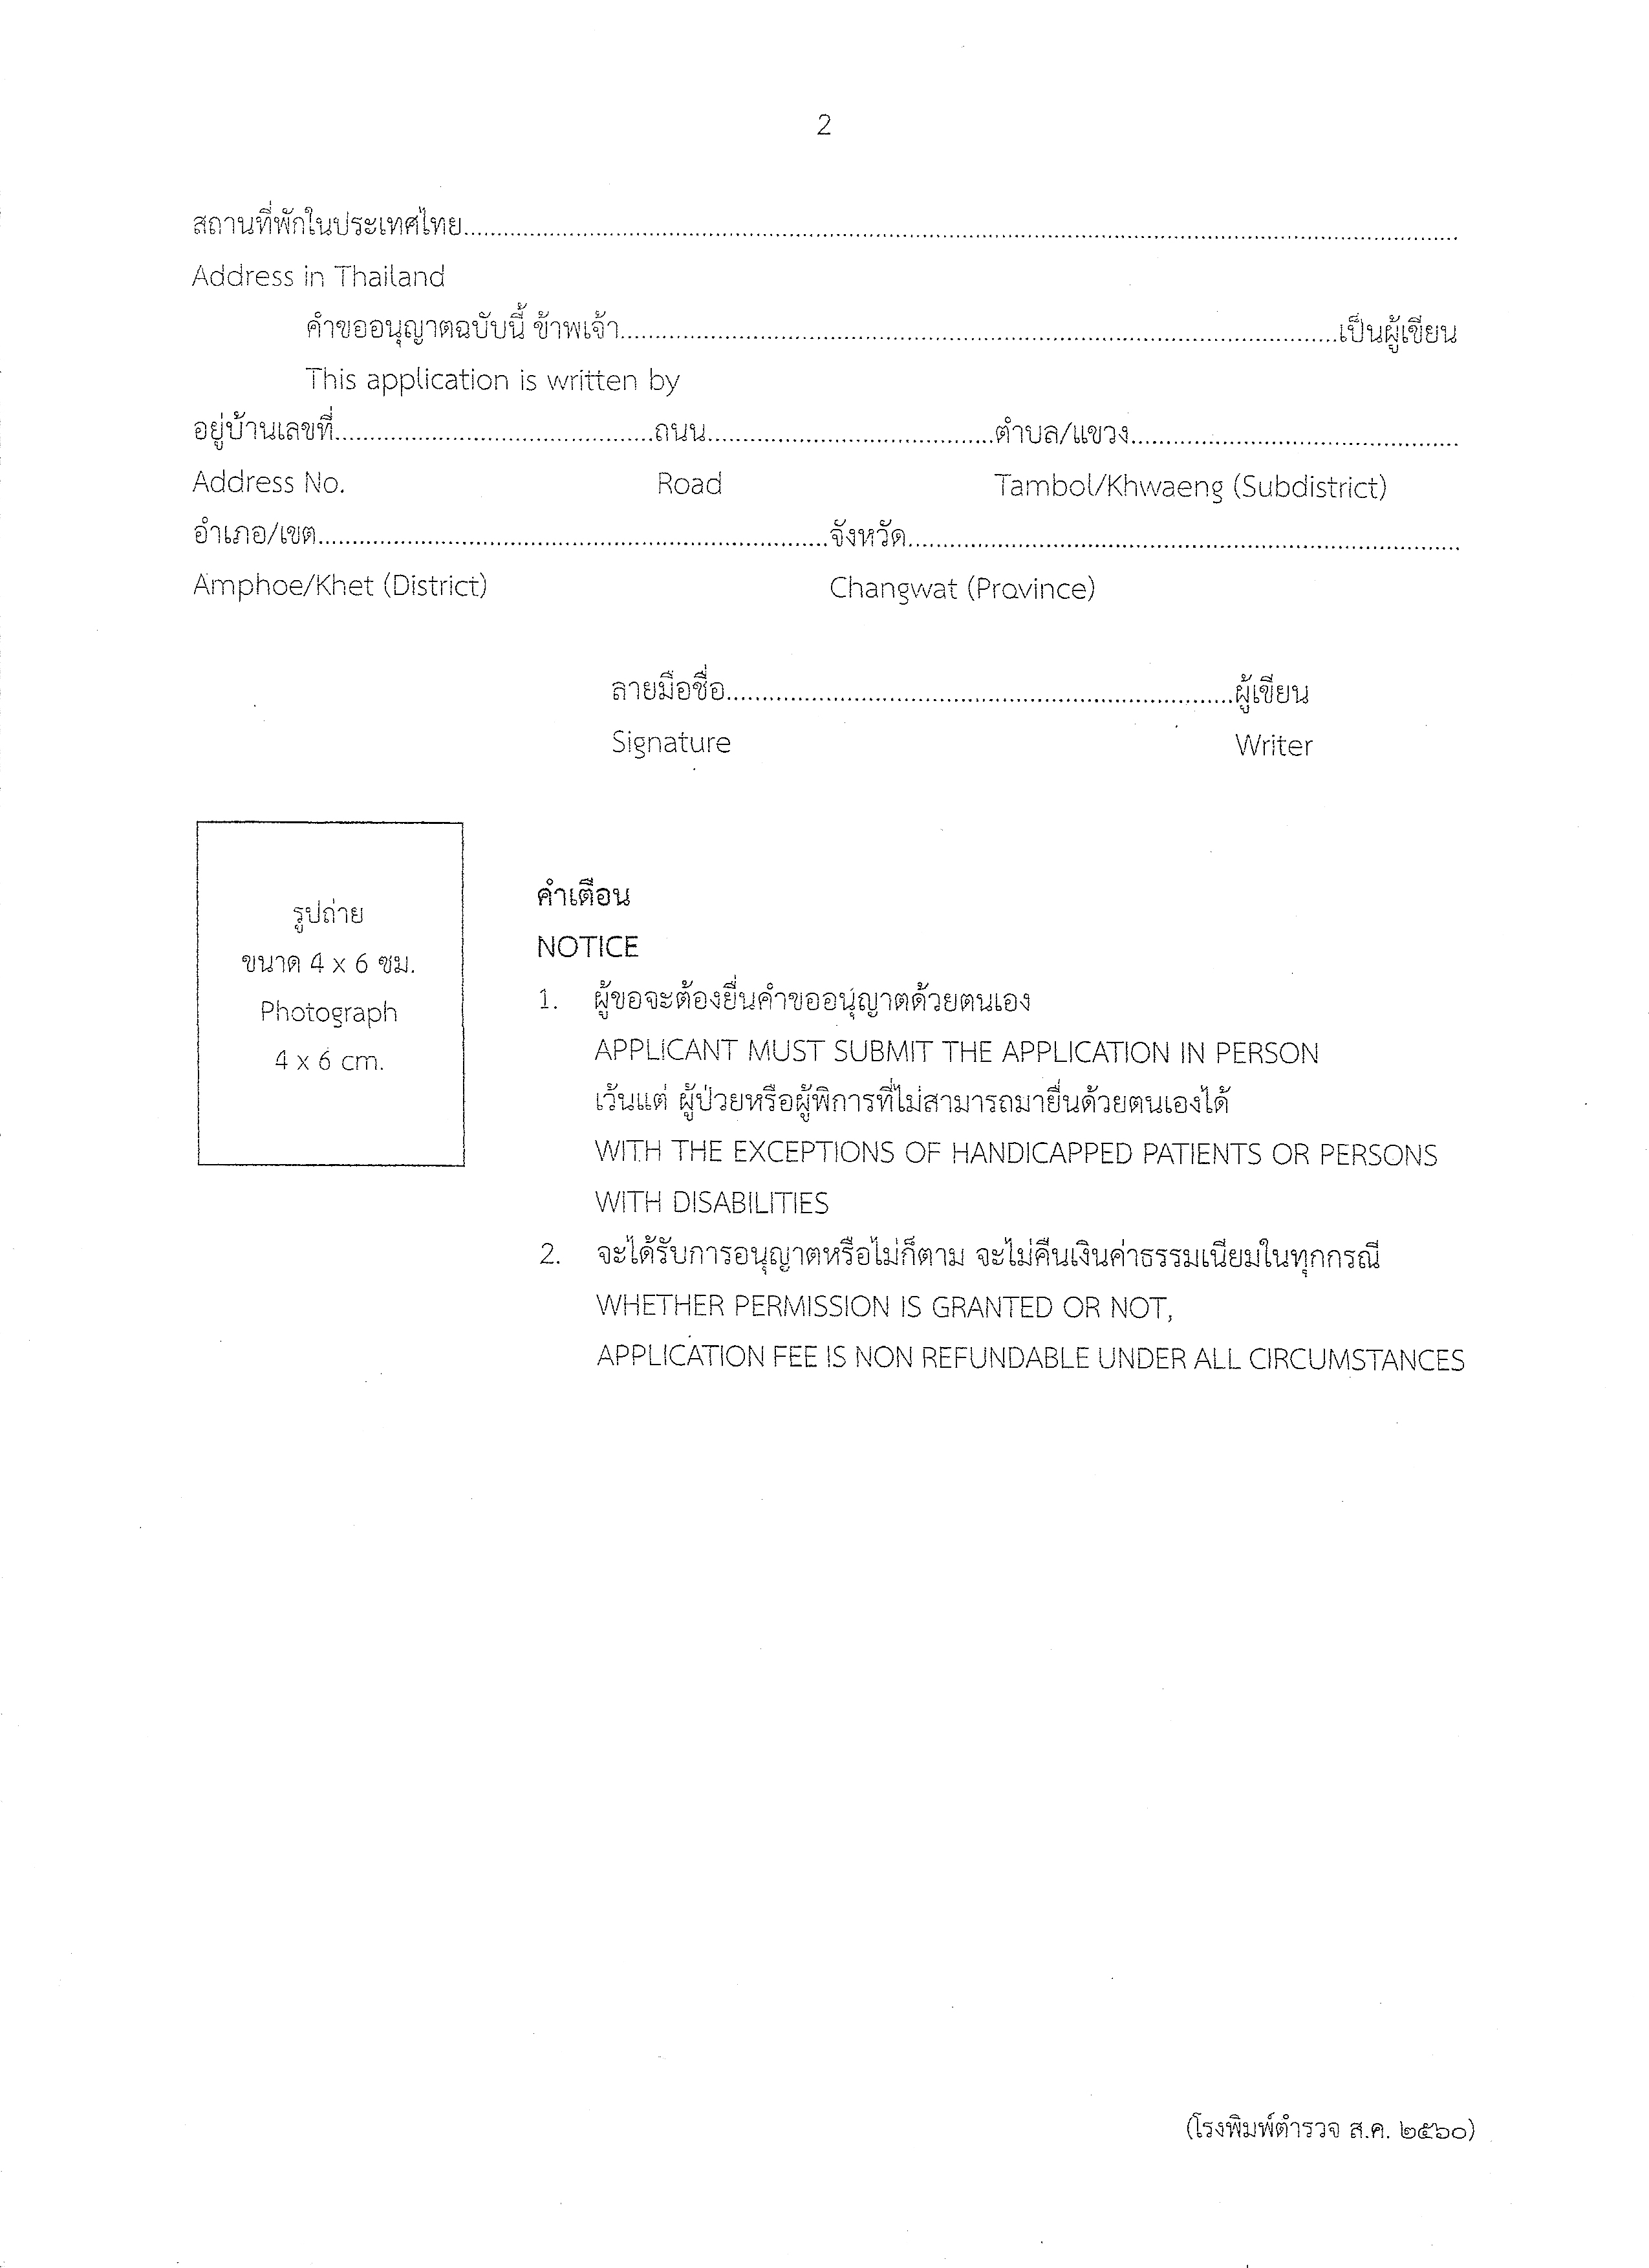 Jomtien Immigration Office New Tm7 Form Pattaya Forum Thailand Visa Forum By Thai Visa The Nation